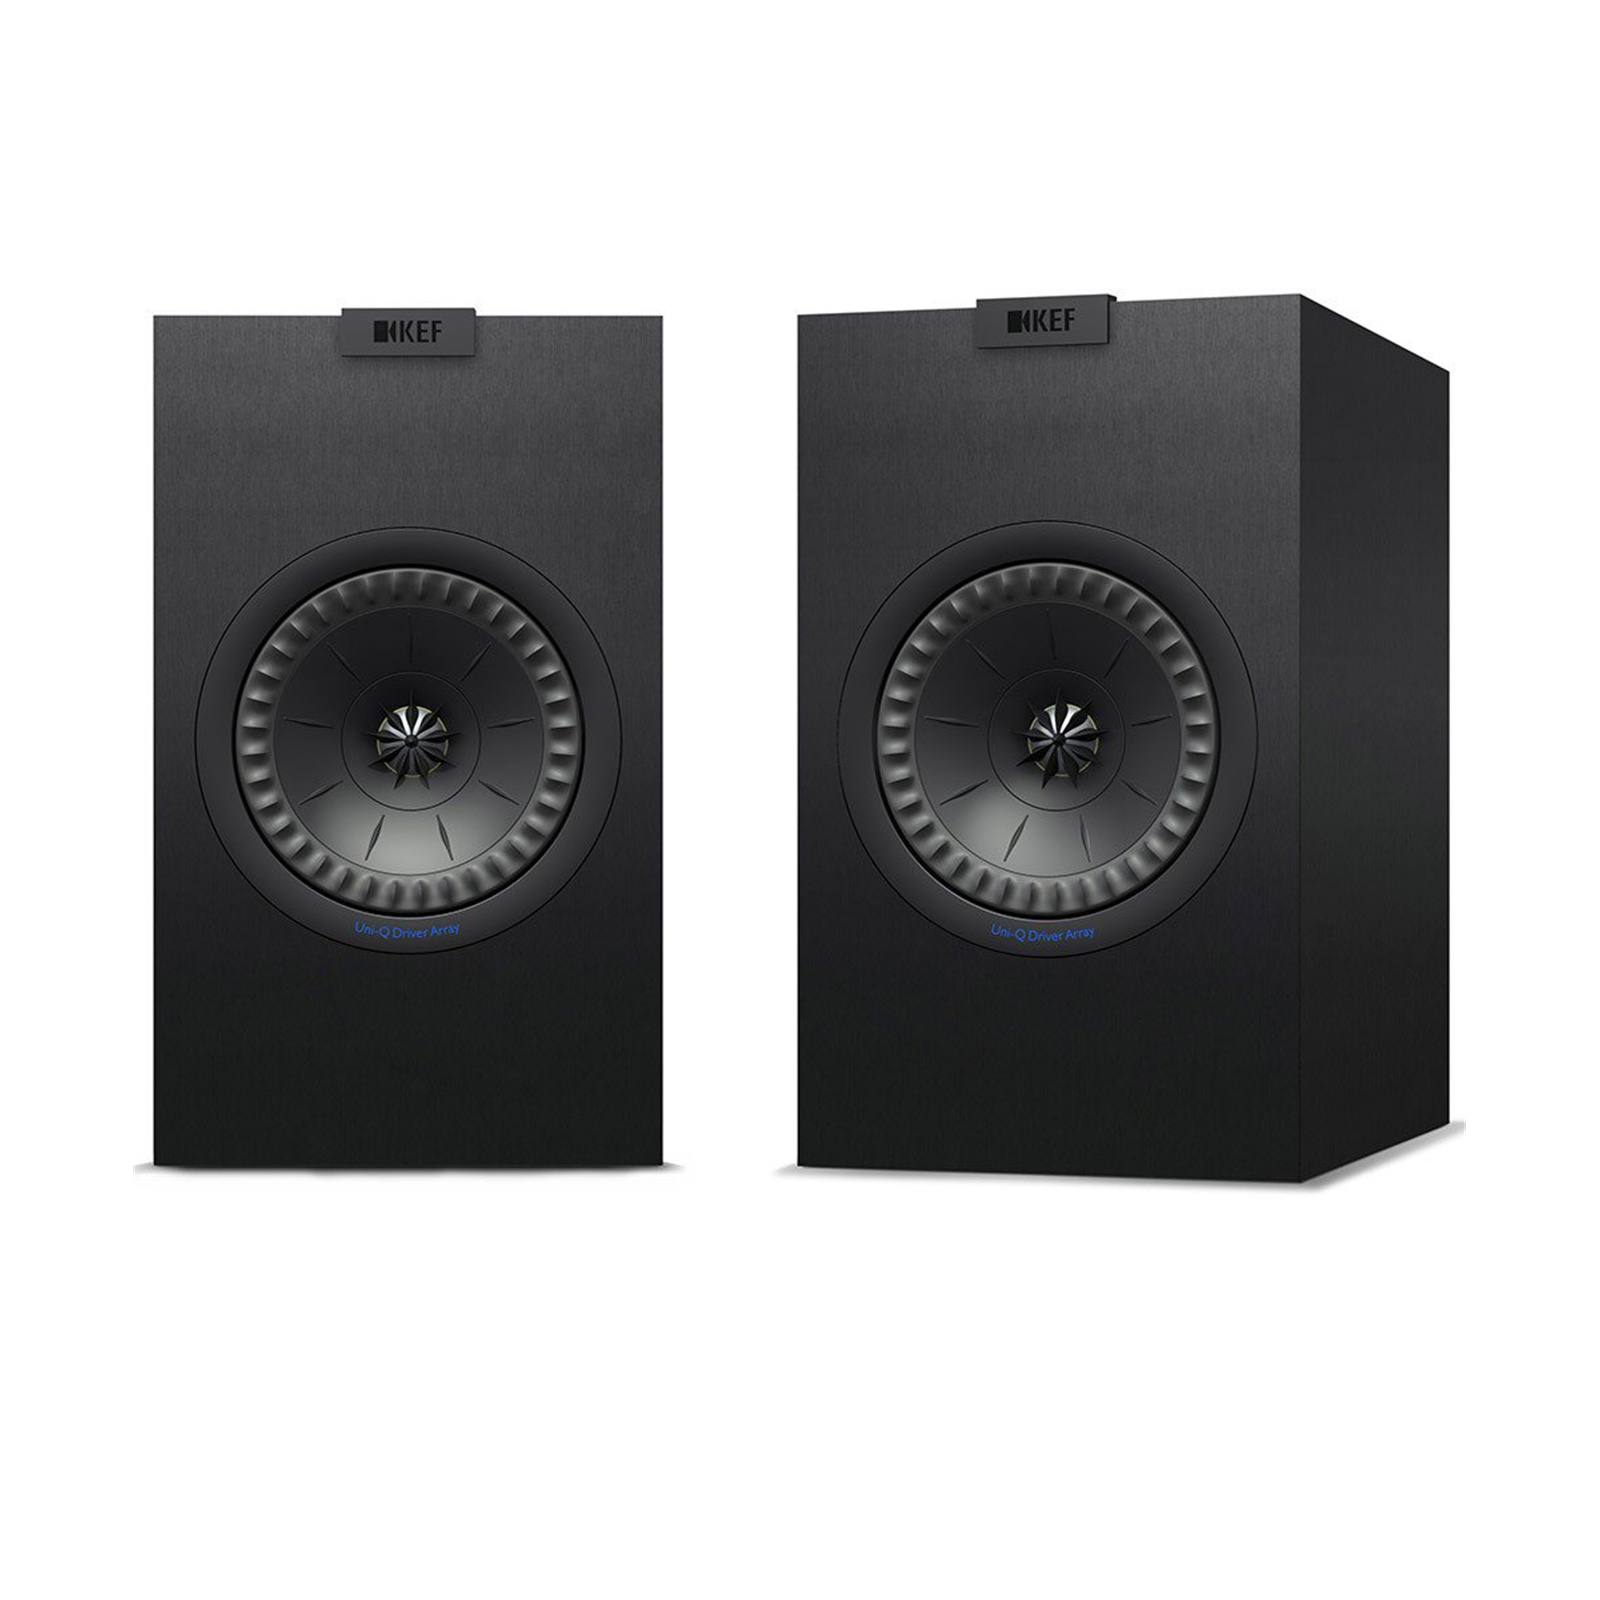 KEF Bookshelf Speaker CFD Designed Port 2 Way Bass ReflexUni Q Array 1 X 525 Uni HF Drivers Colour Black SOLD AS PAIR